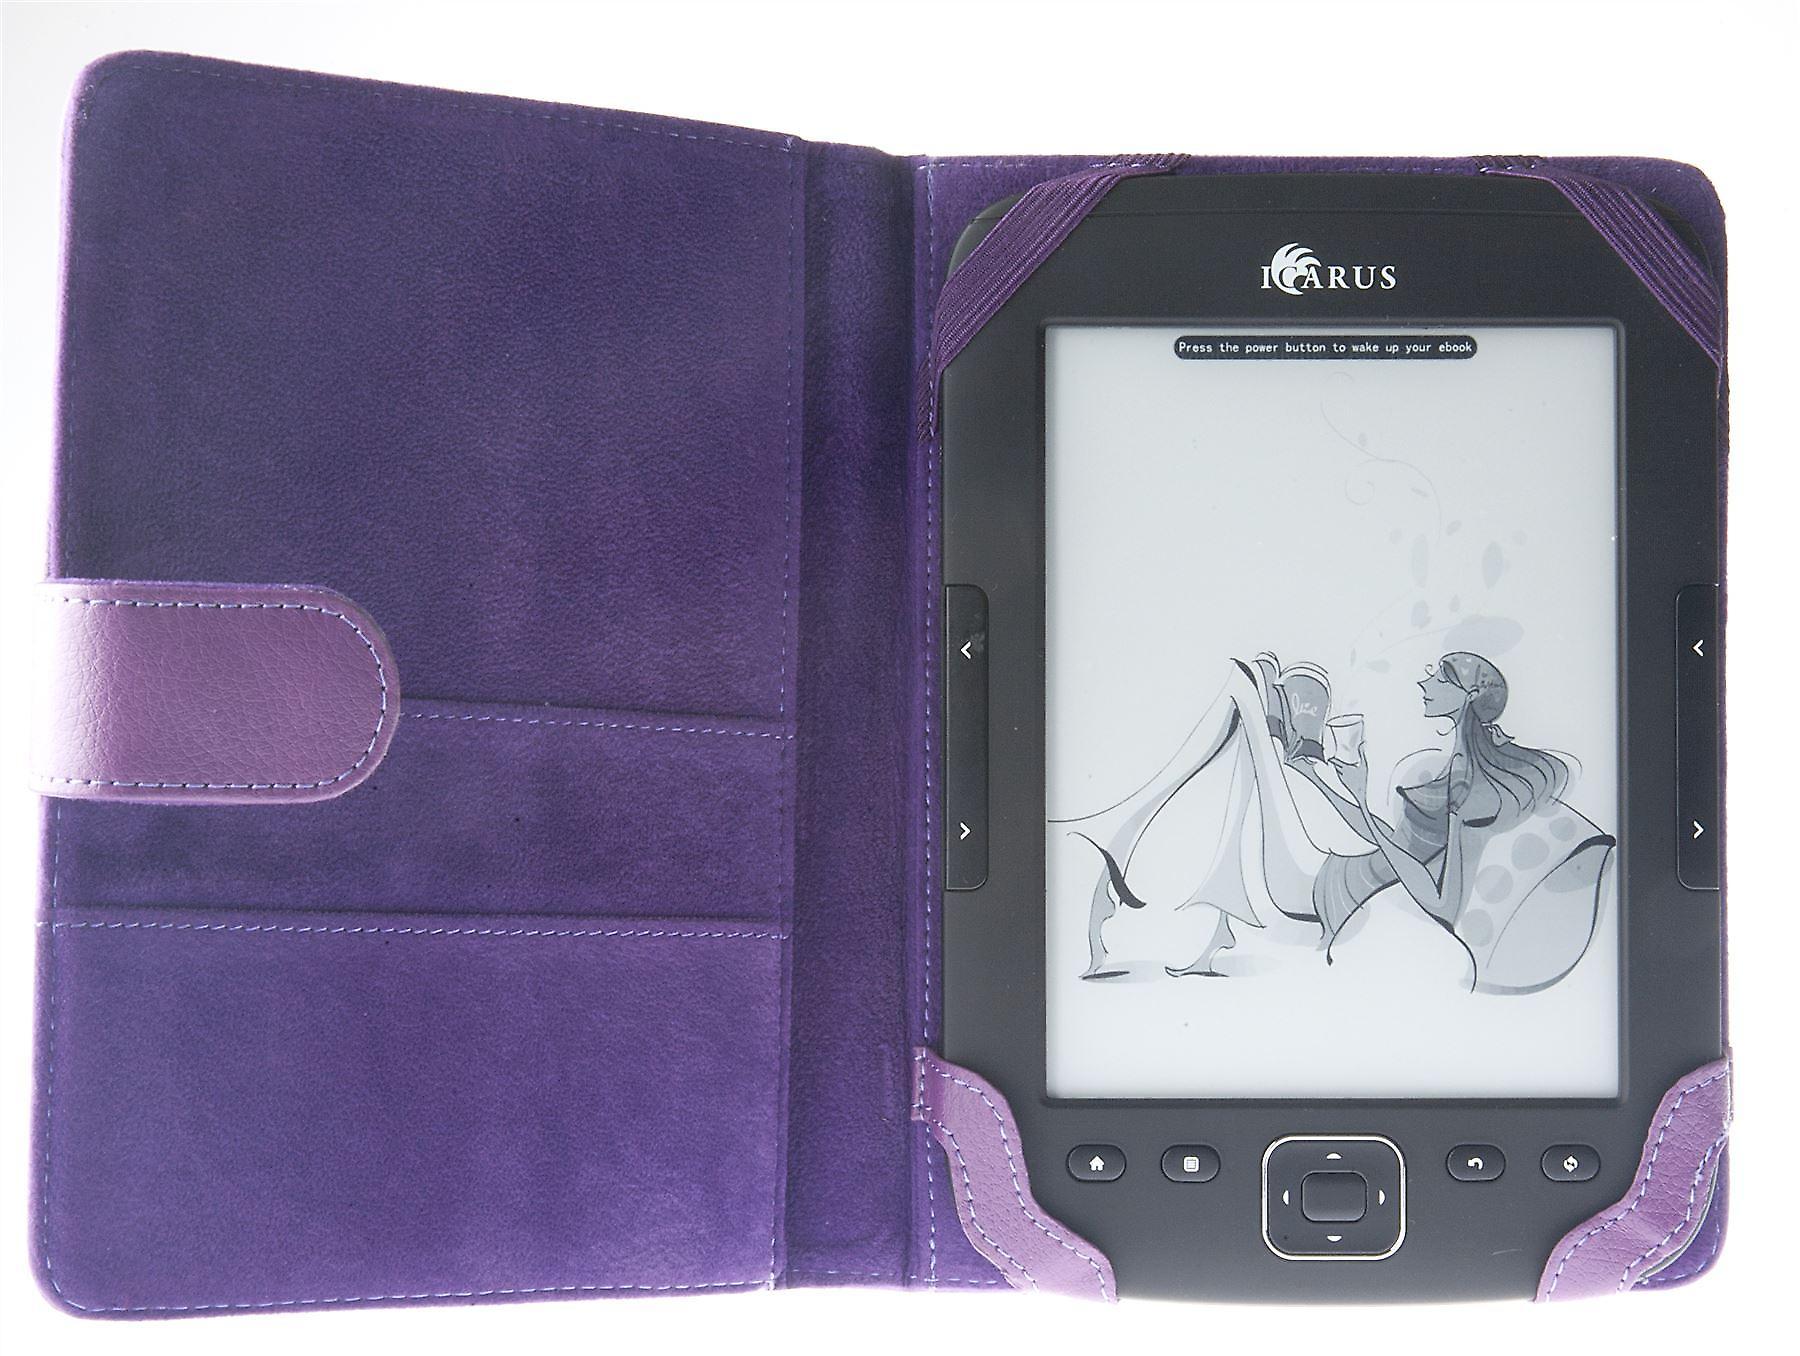 ICARUS couverture lila pour Illumina HD / Pocket / Sense G2